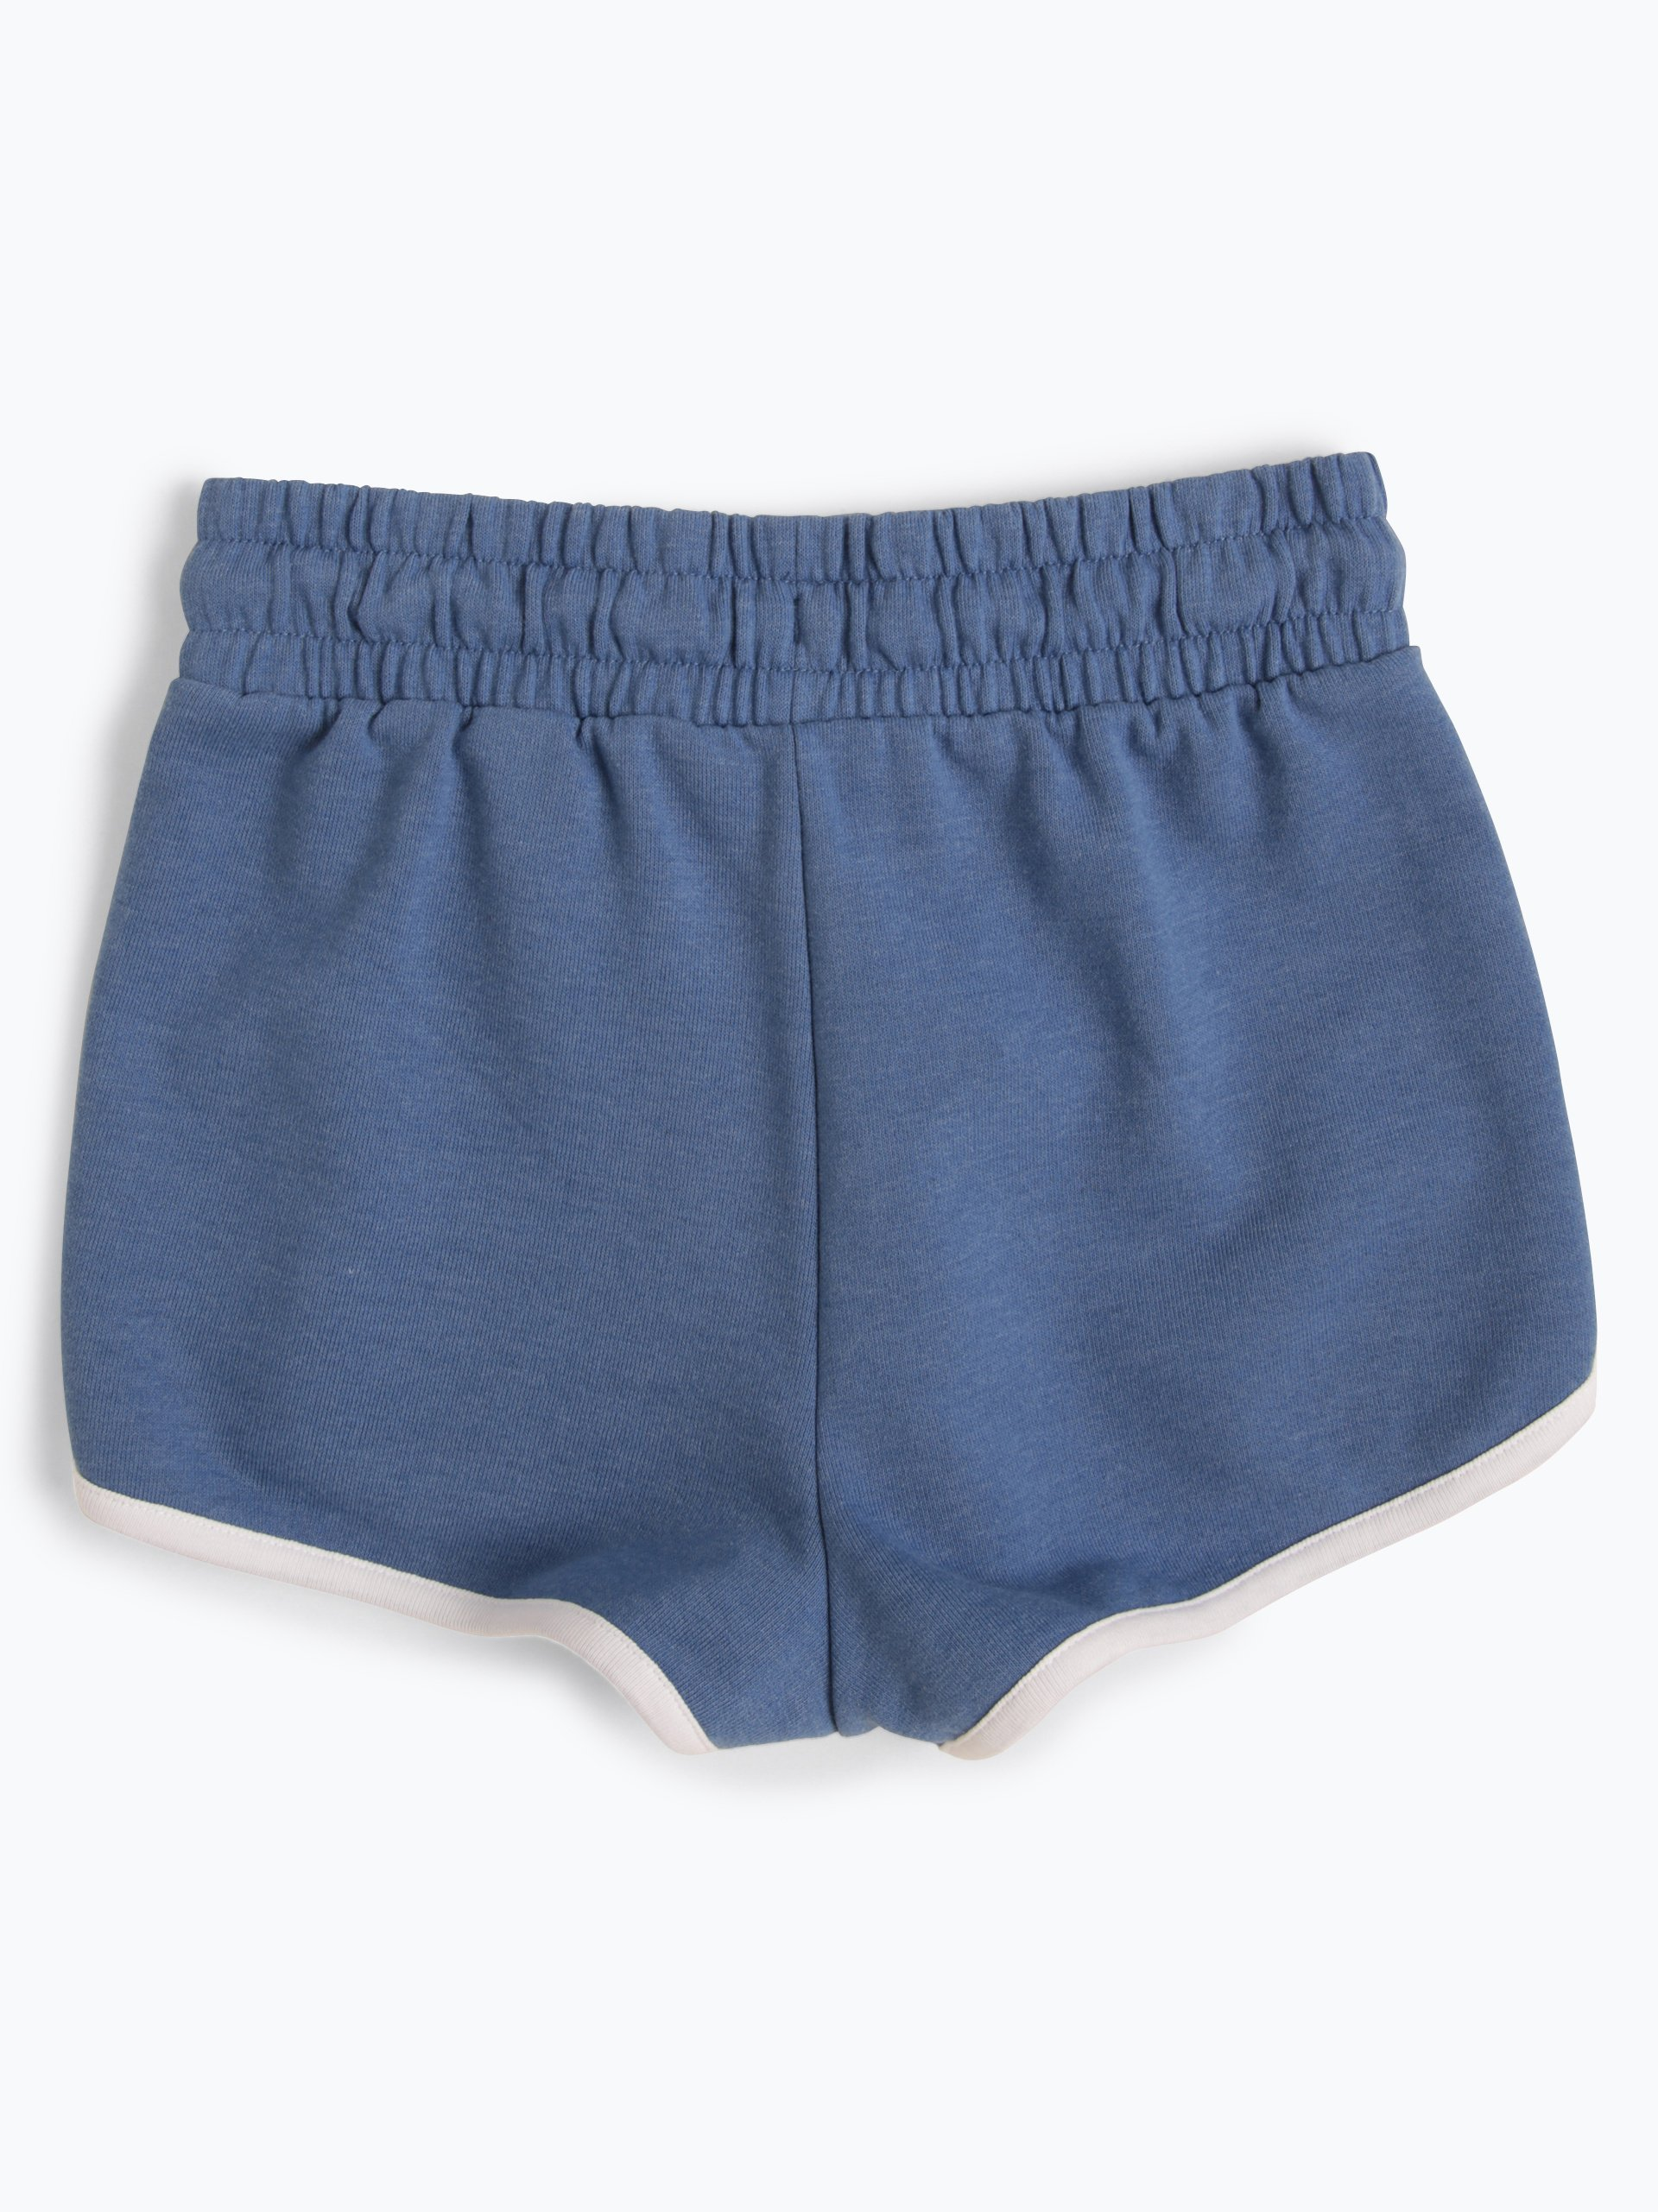 Review Mädchen Shorts